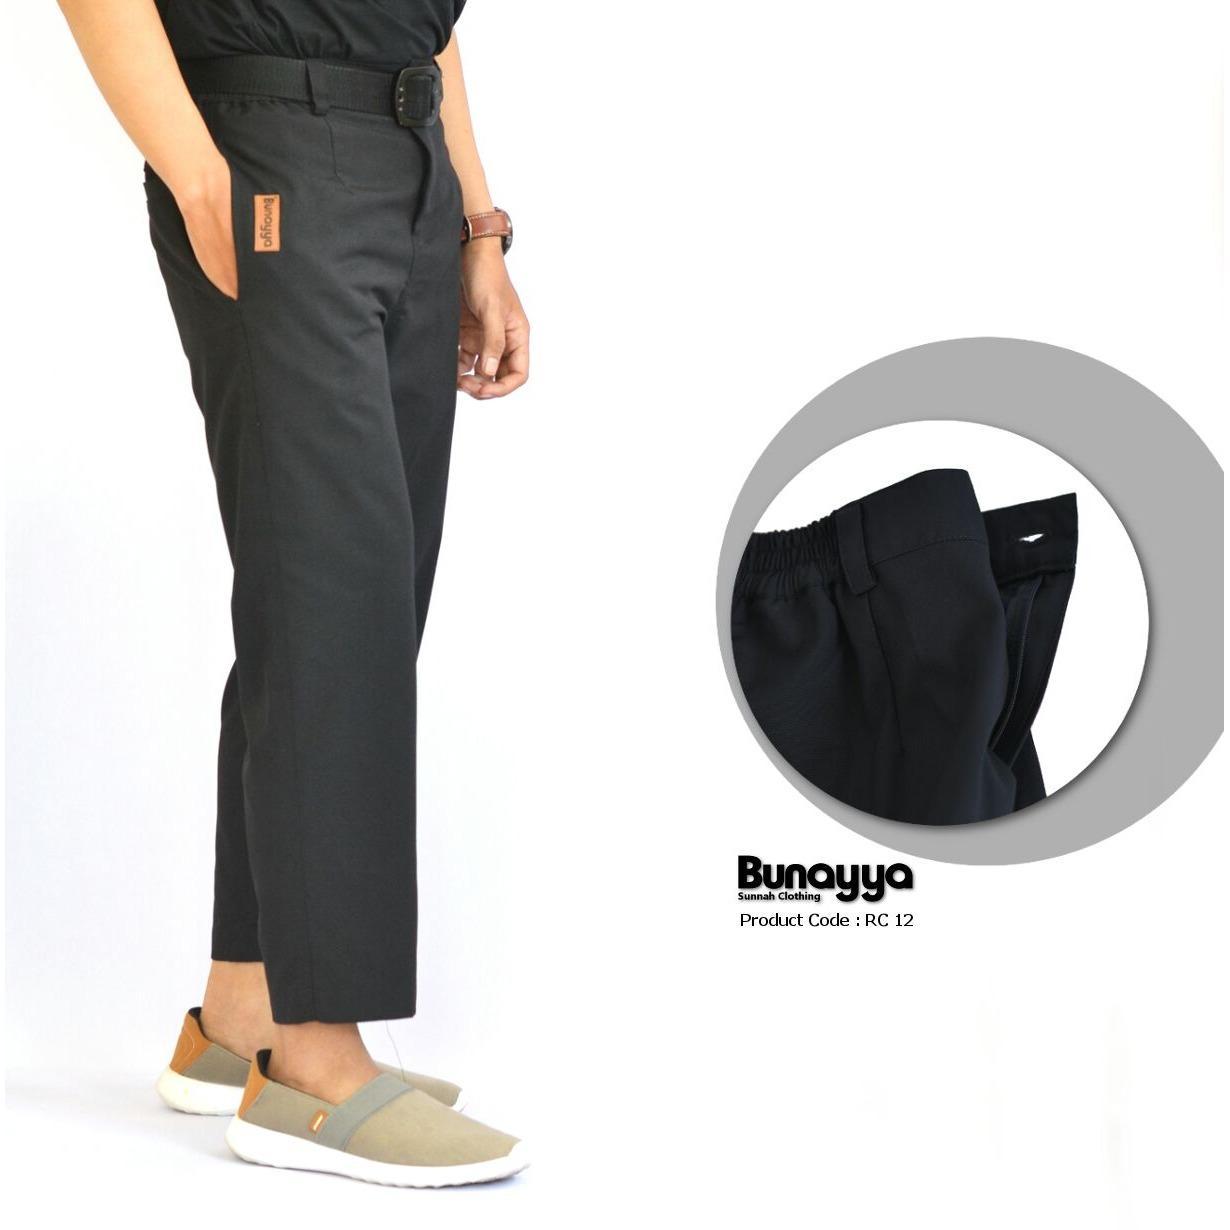 Toko Indonesia Best Buy Baju Muslim 01 11 18 Koko Garsel Fashion Fny 003 Img